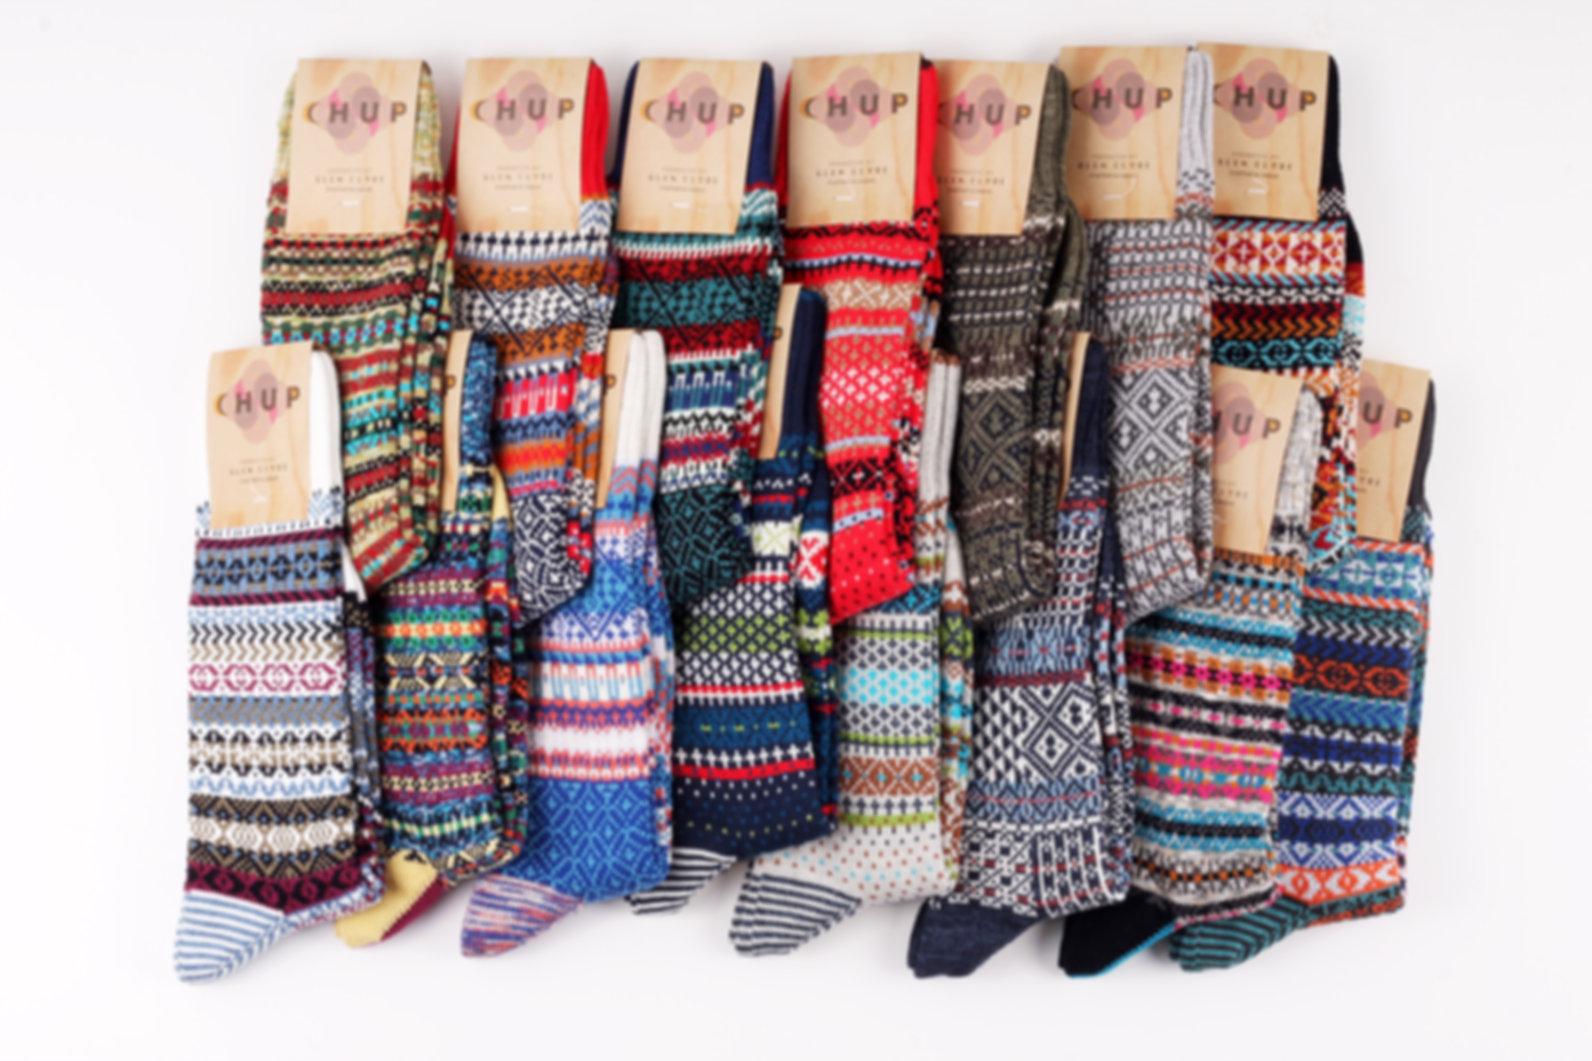 Chup Socks SS19